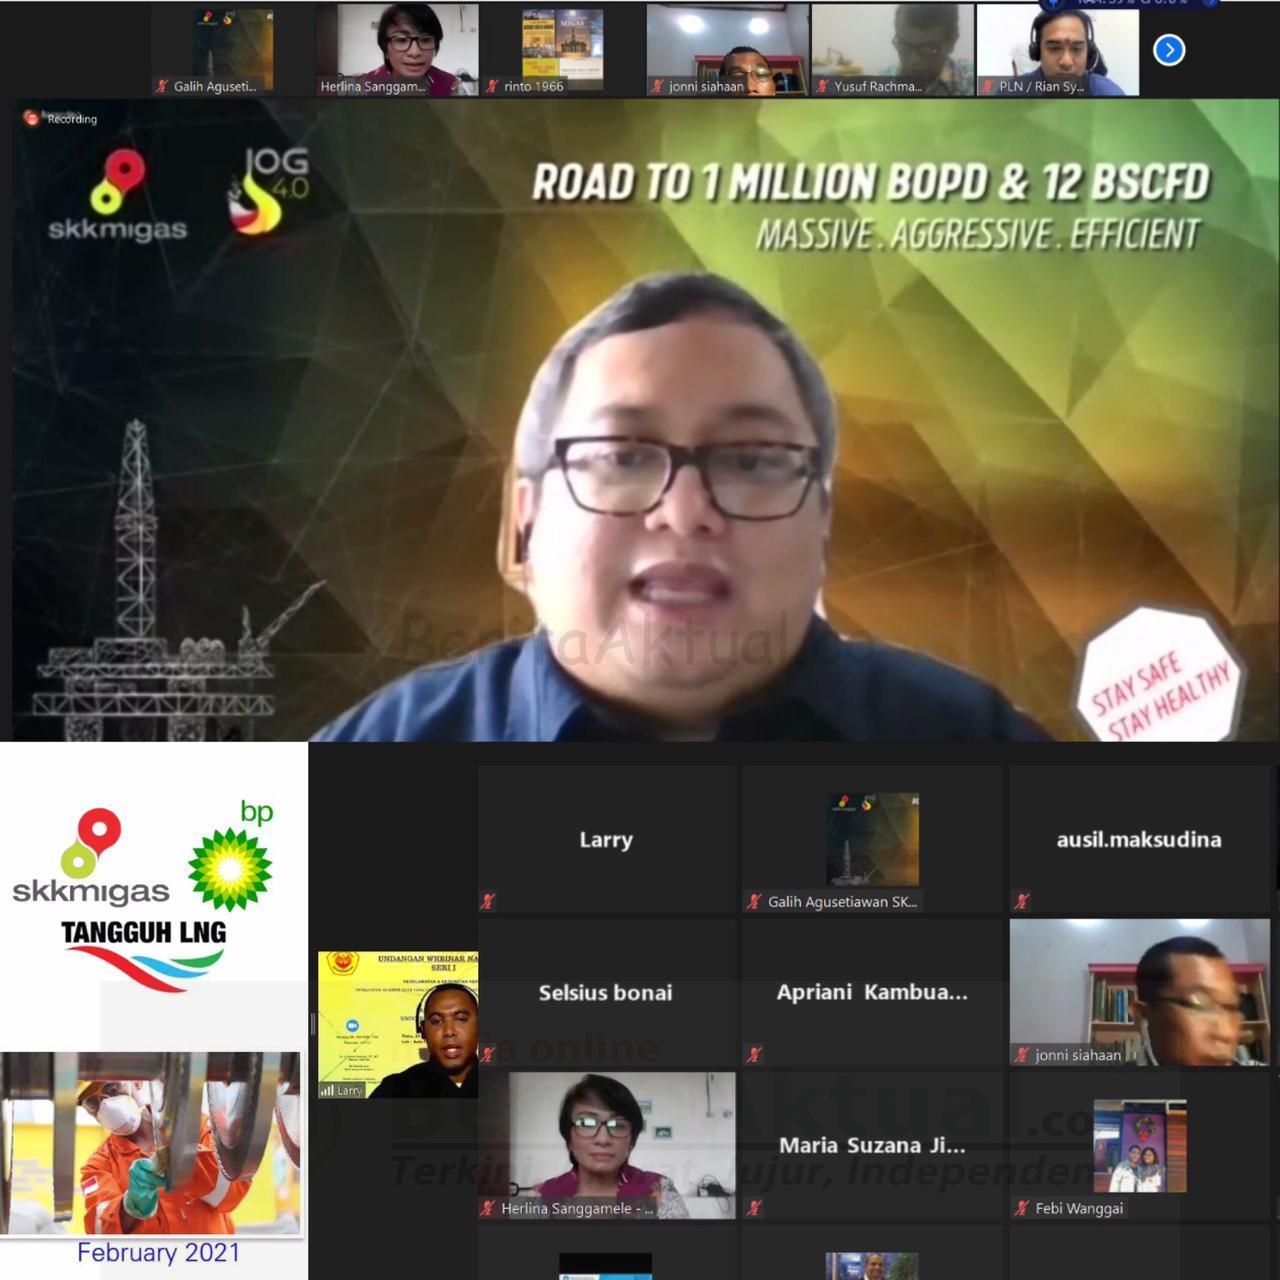 Industri Hulu Migas Wil Papua Maluku Dukung Pencanangan Bulan K3 Bersama Civitas Akademika Uncen 16 IMG 20210225 WA0001